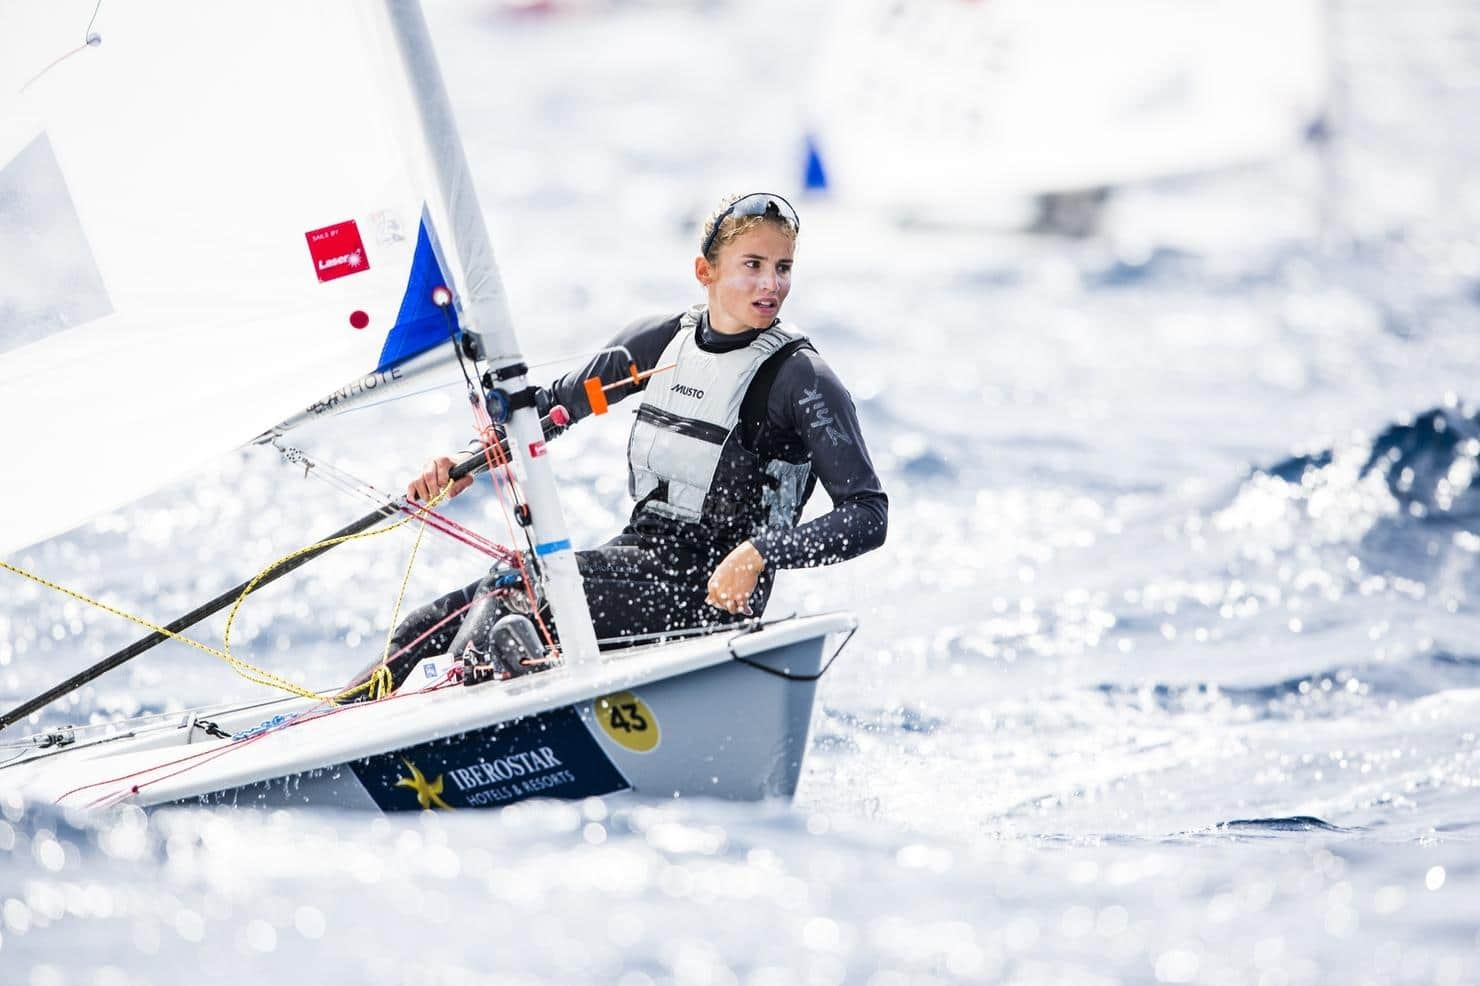 Olympic Classes - World Ranking Lists du 23 mars - Maud Jayet SUI 6è, Schneiter/Cujean 8è. !